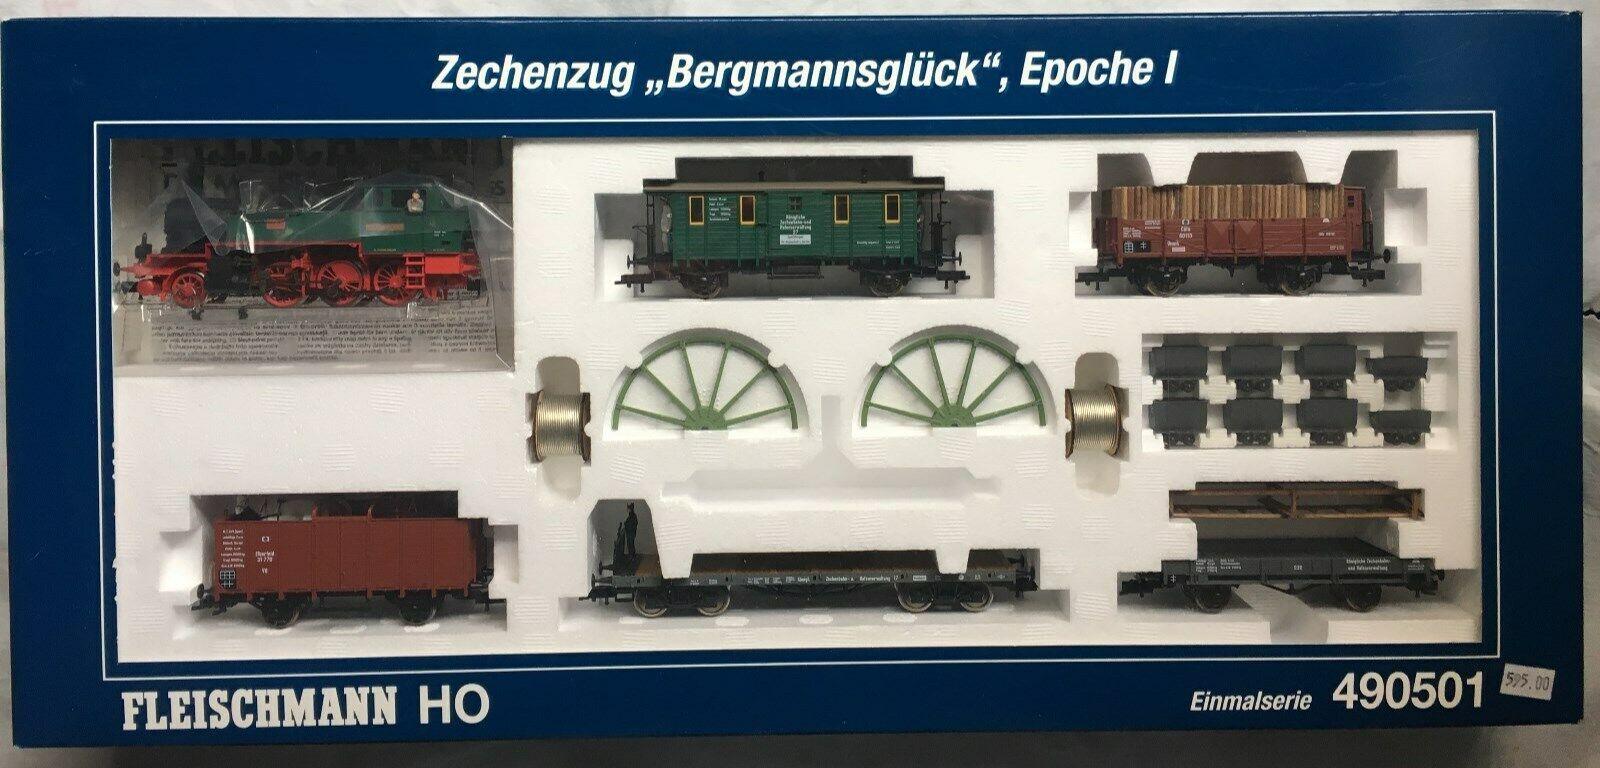 Fleischuomon 490501 Zechenzug Berguomonsglück Epoche I Zugset, neu mit OVP